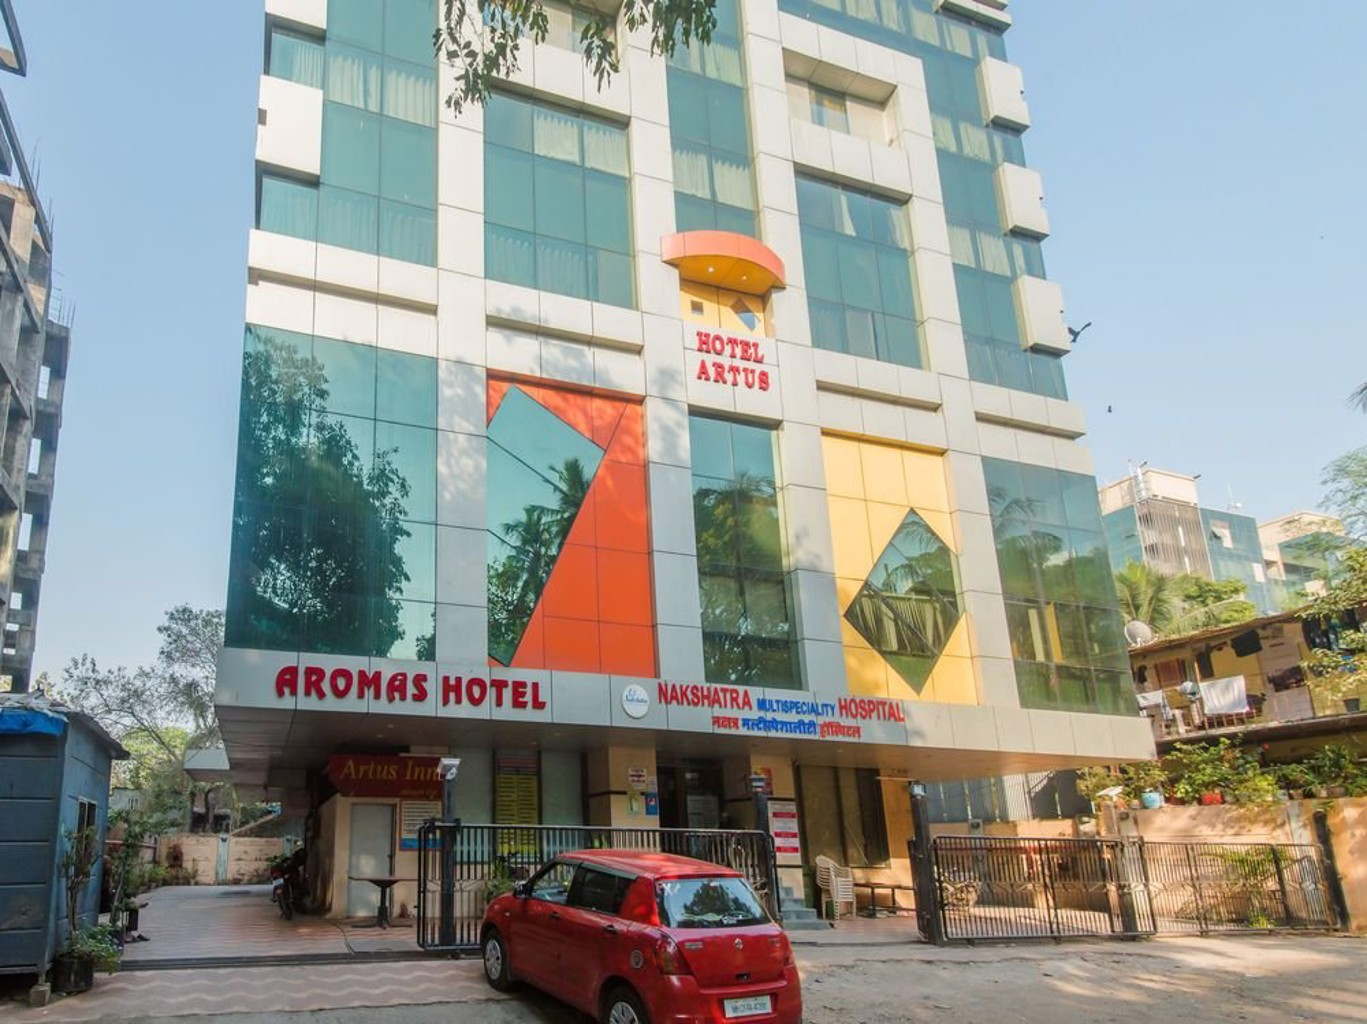 Hotel Artus Inn